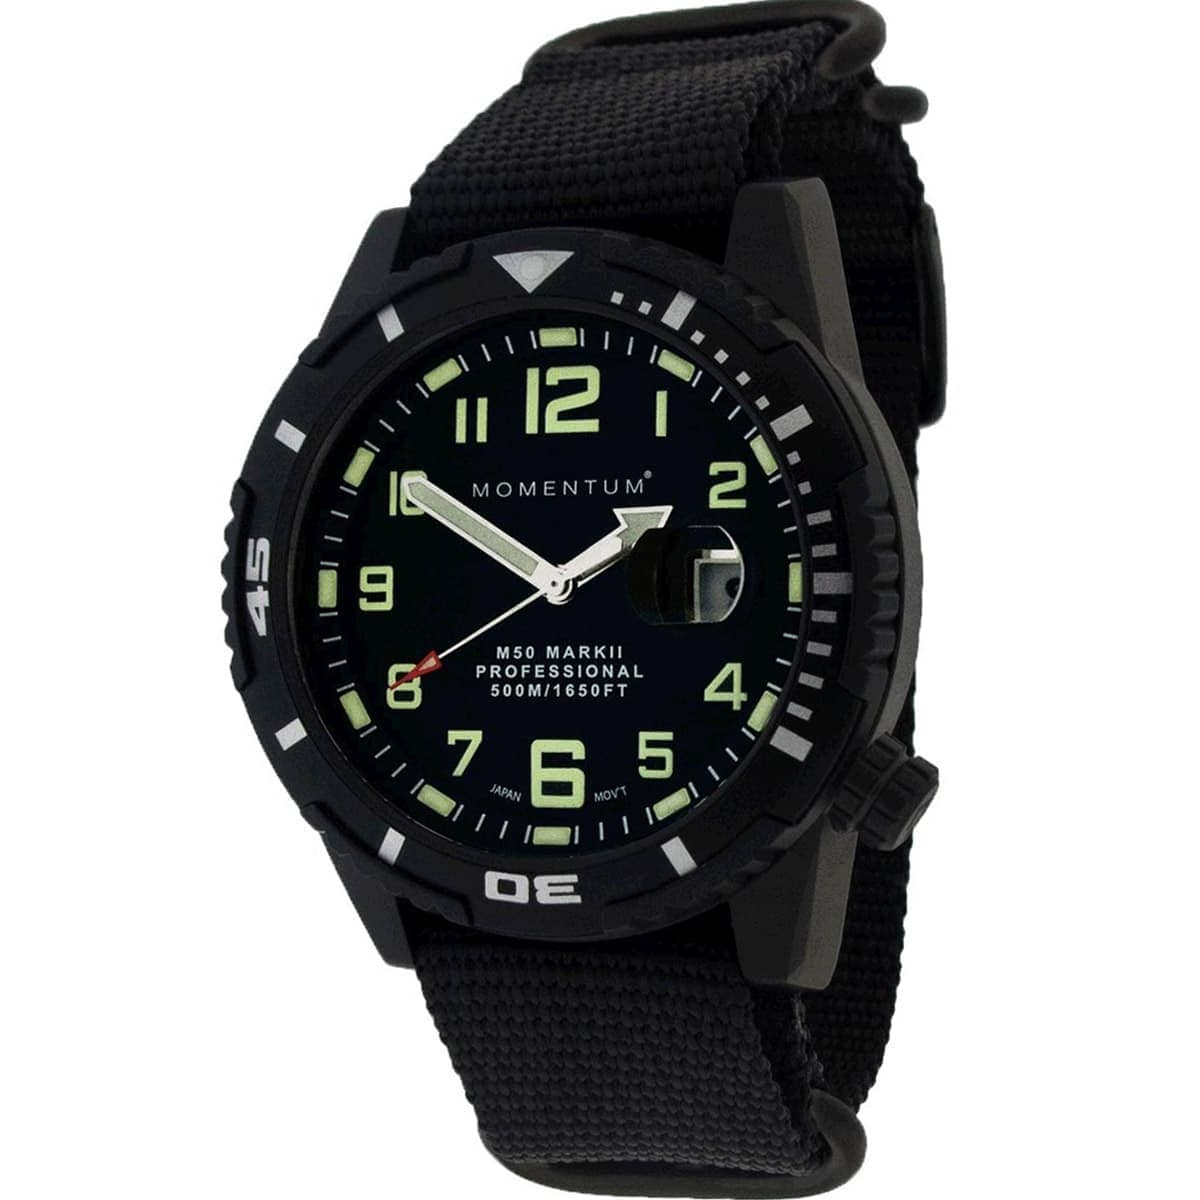 Momentum Watch M50 Mark II Black-Ion 44MM Web NATO